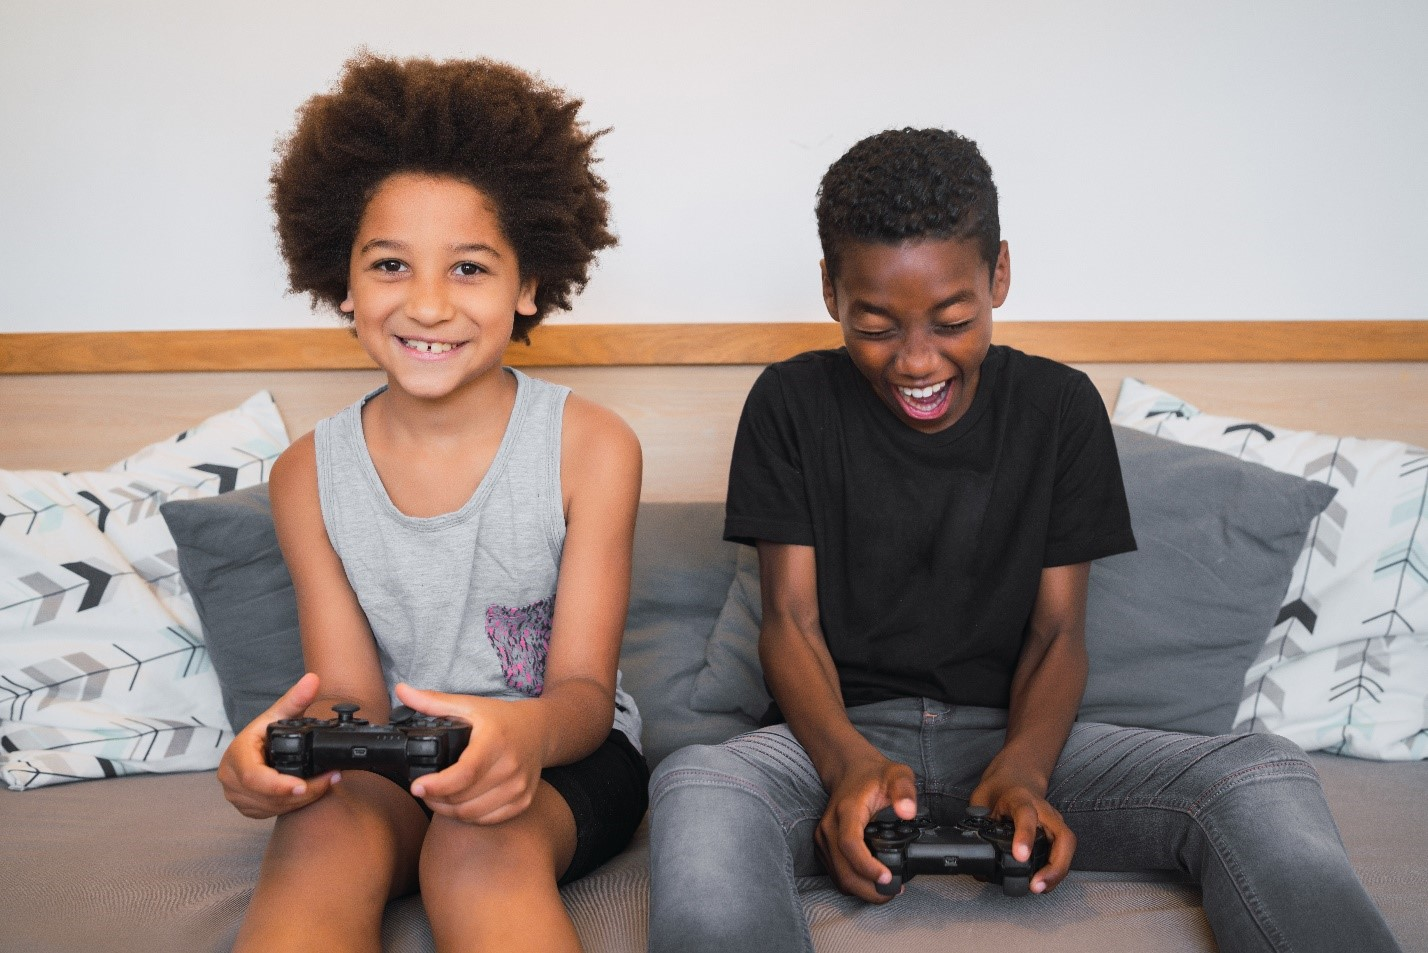 Five Video Games that Build STEM Skills